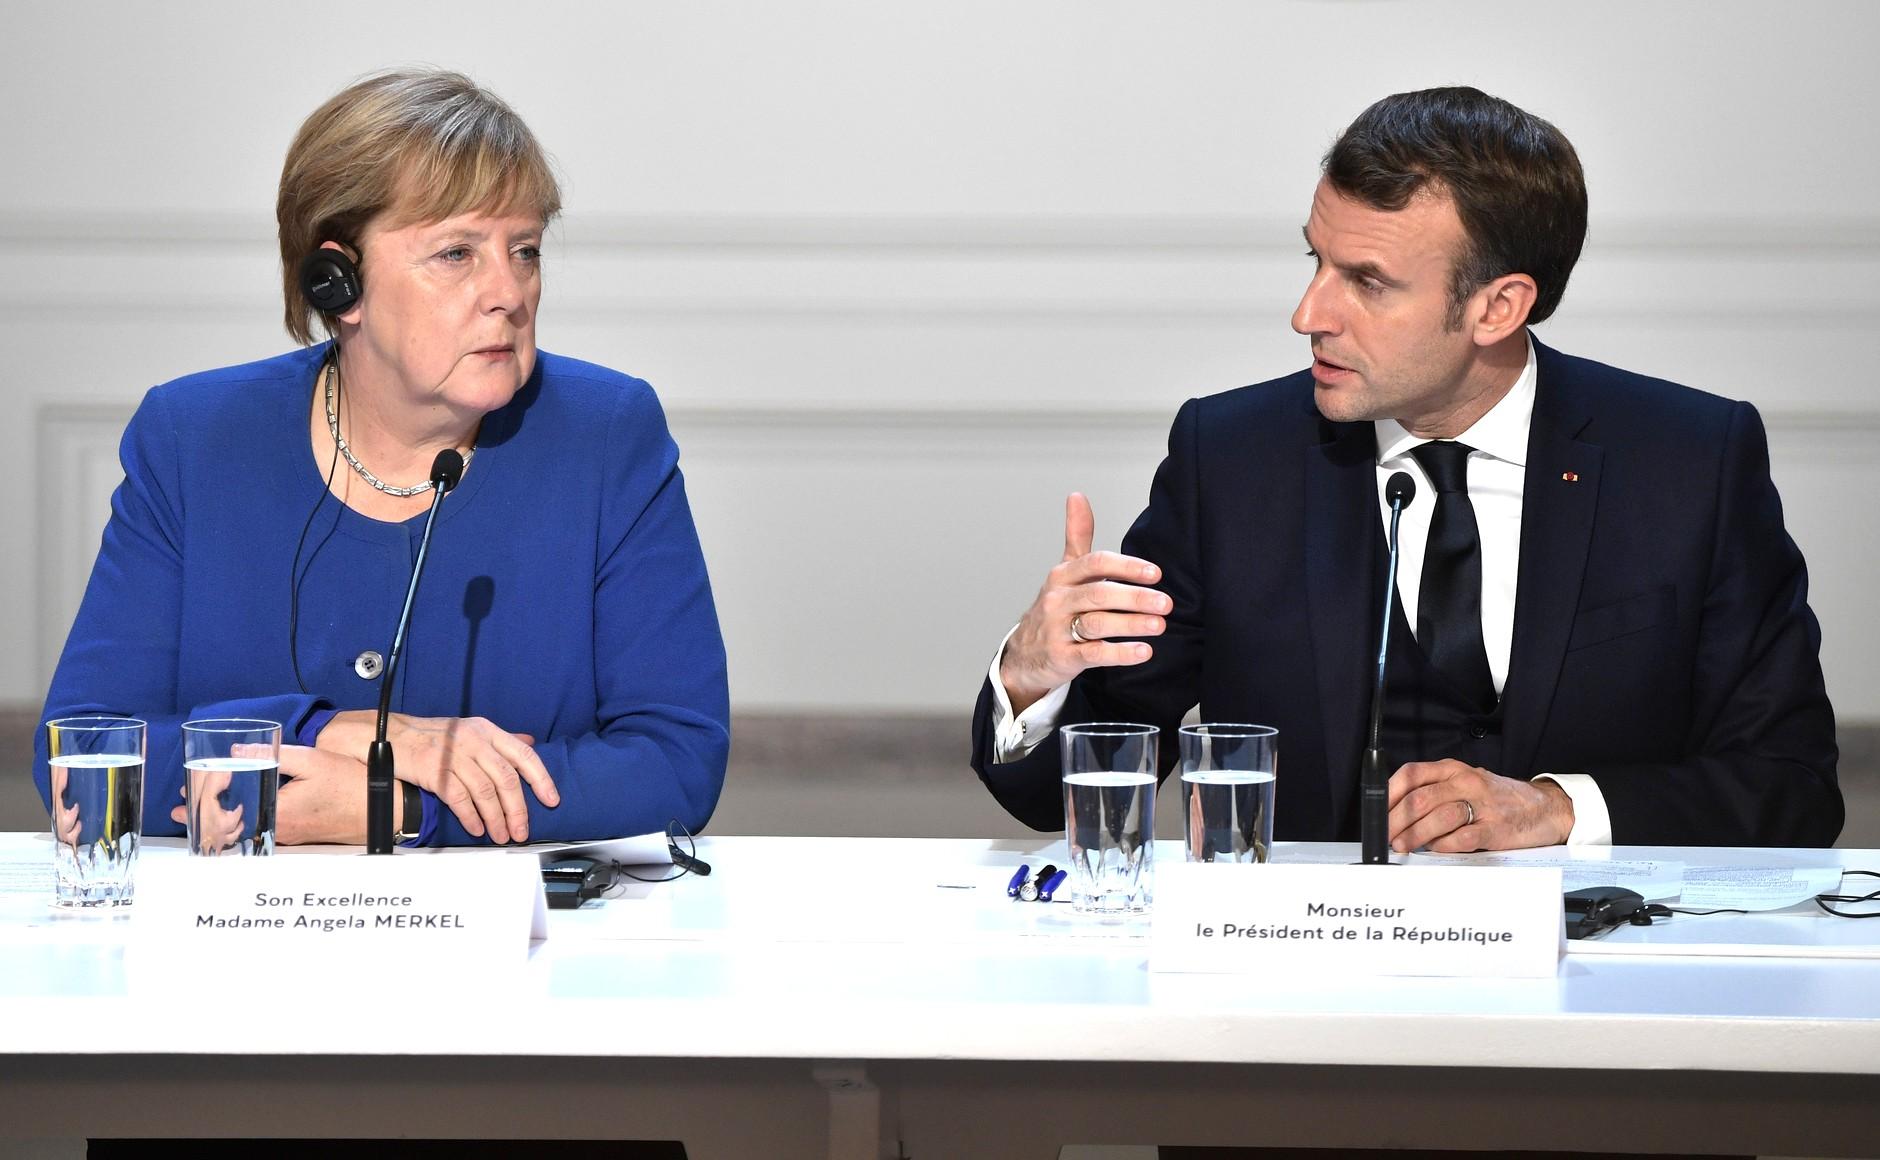 File:Emmanuel Macron and Angela Merkel (2019-12-10).jpg - Wikimedia Commons